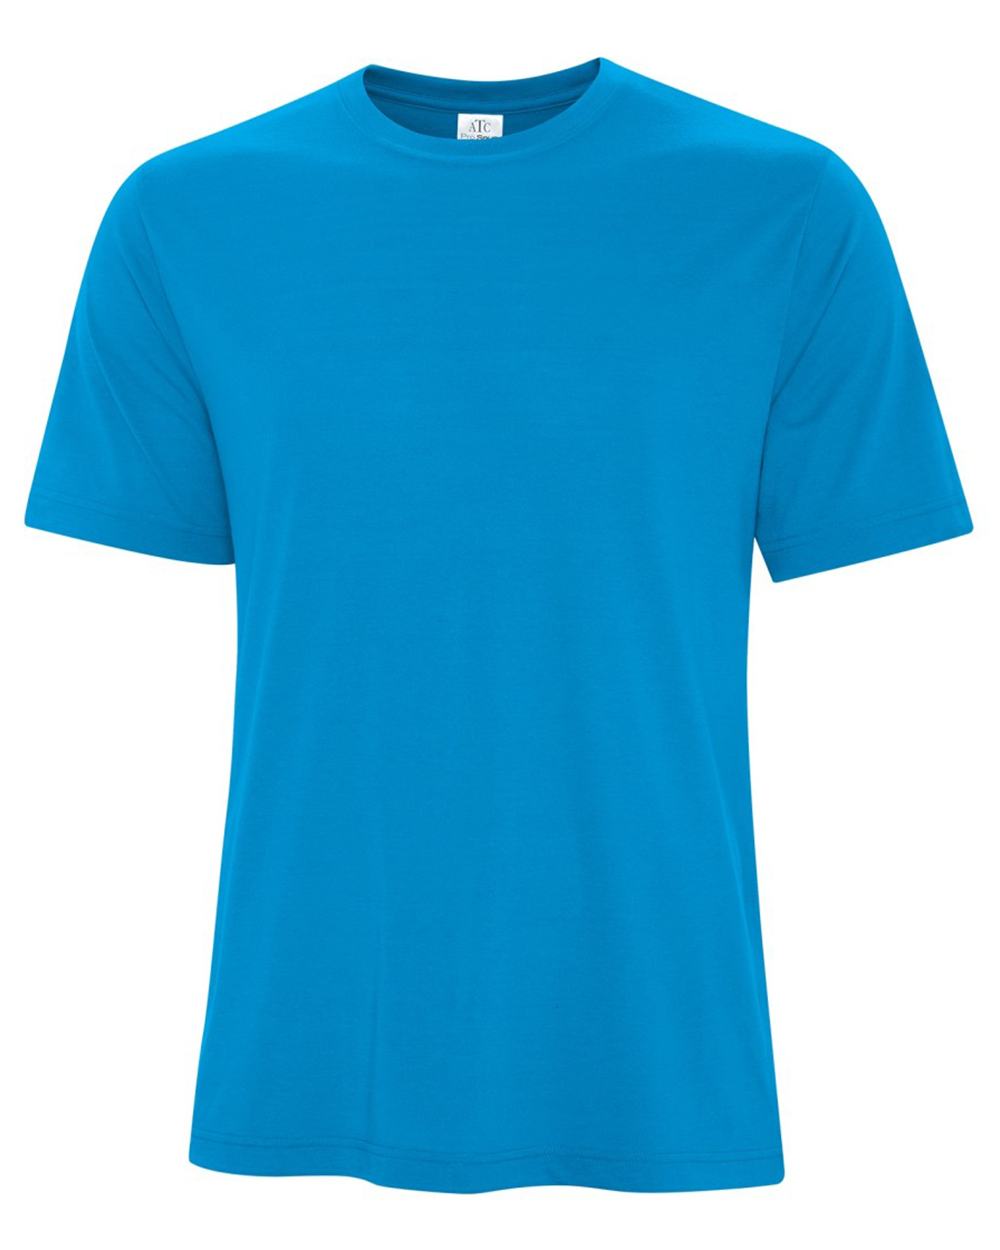 Pro Spun T-Shirt